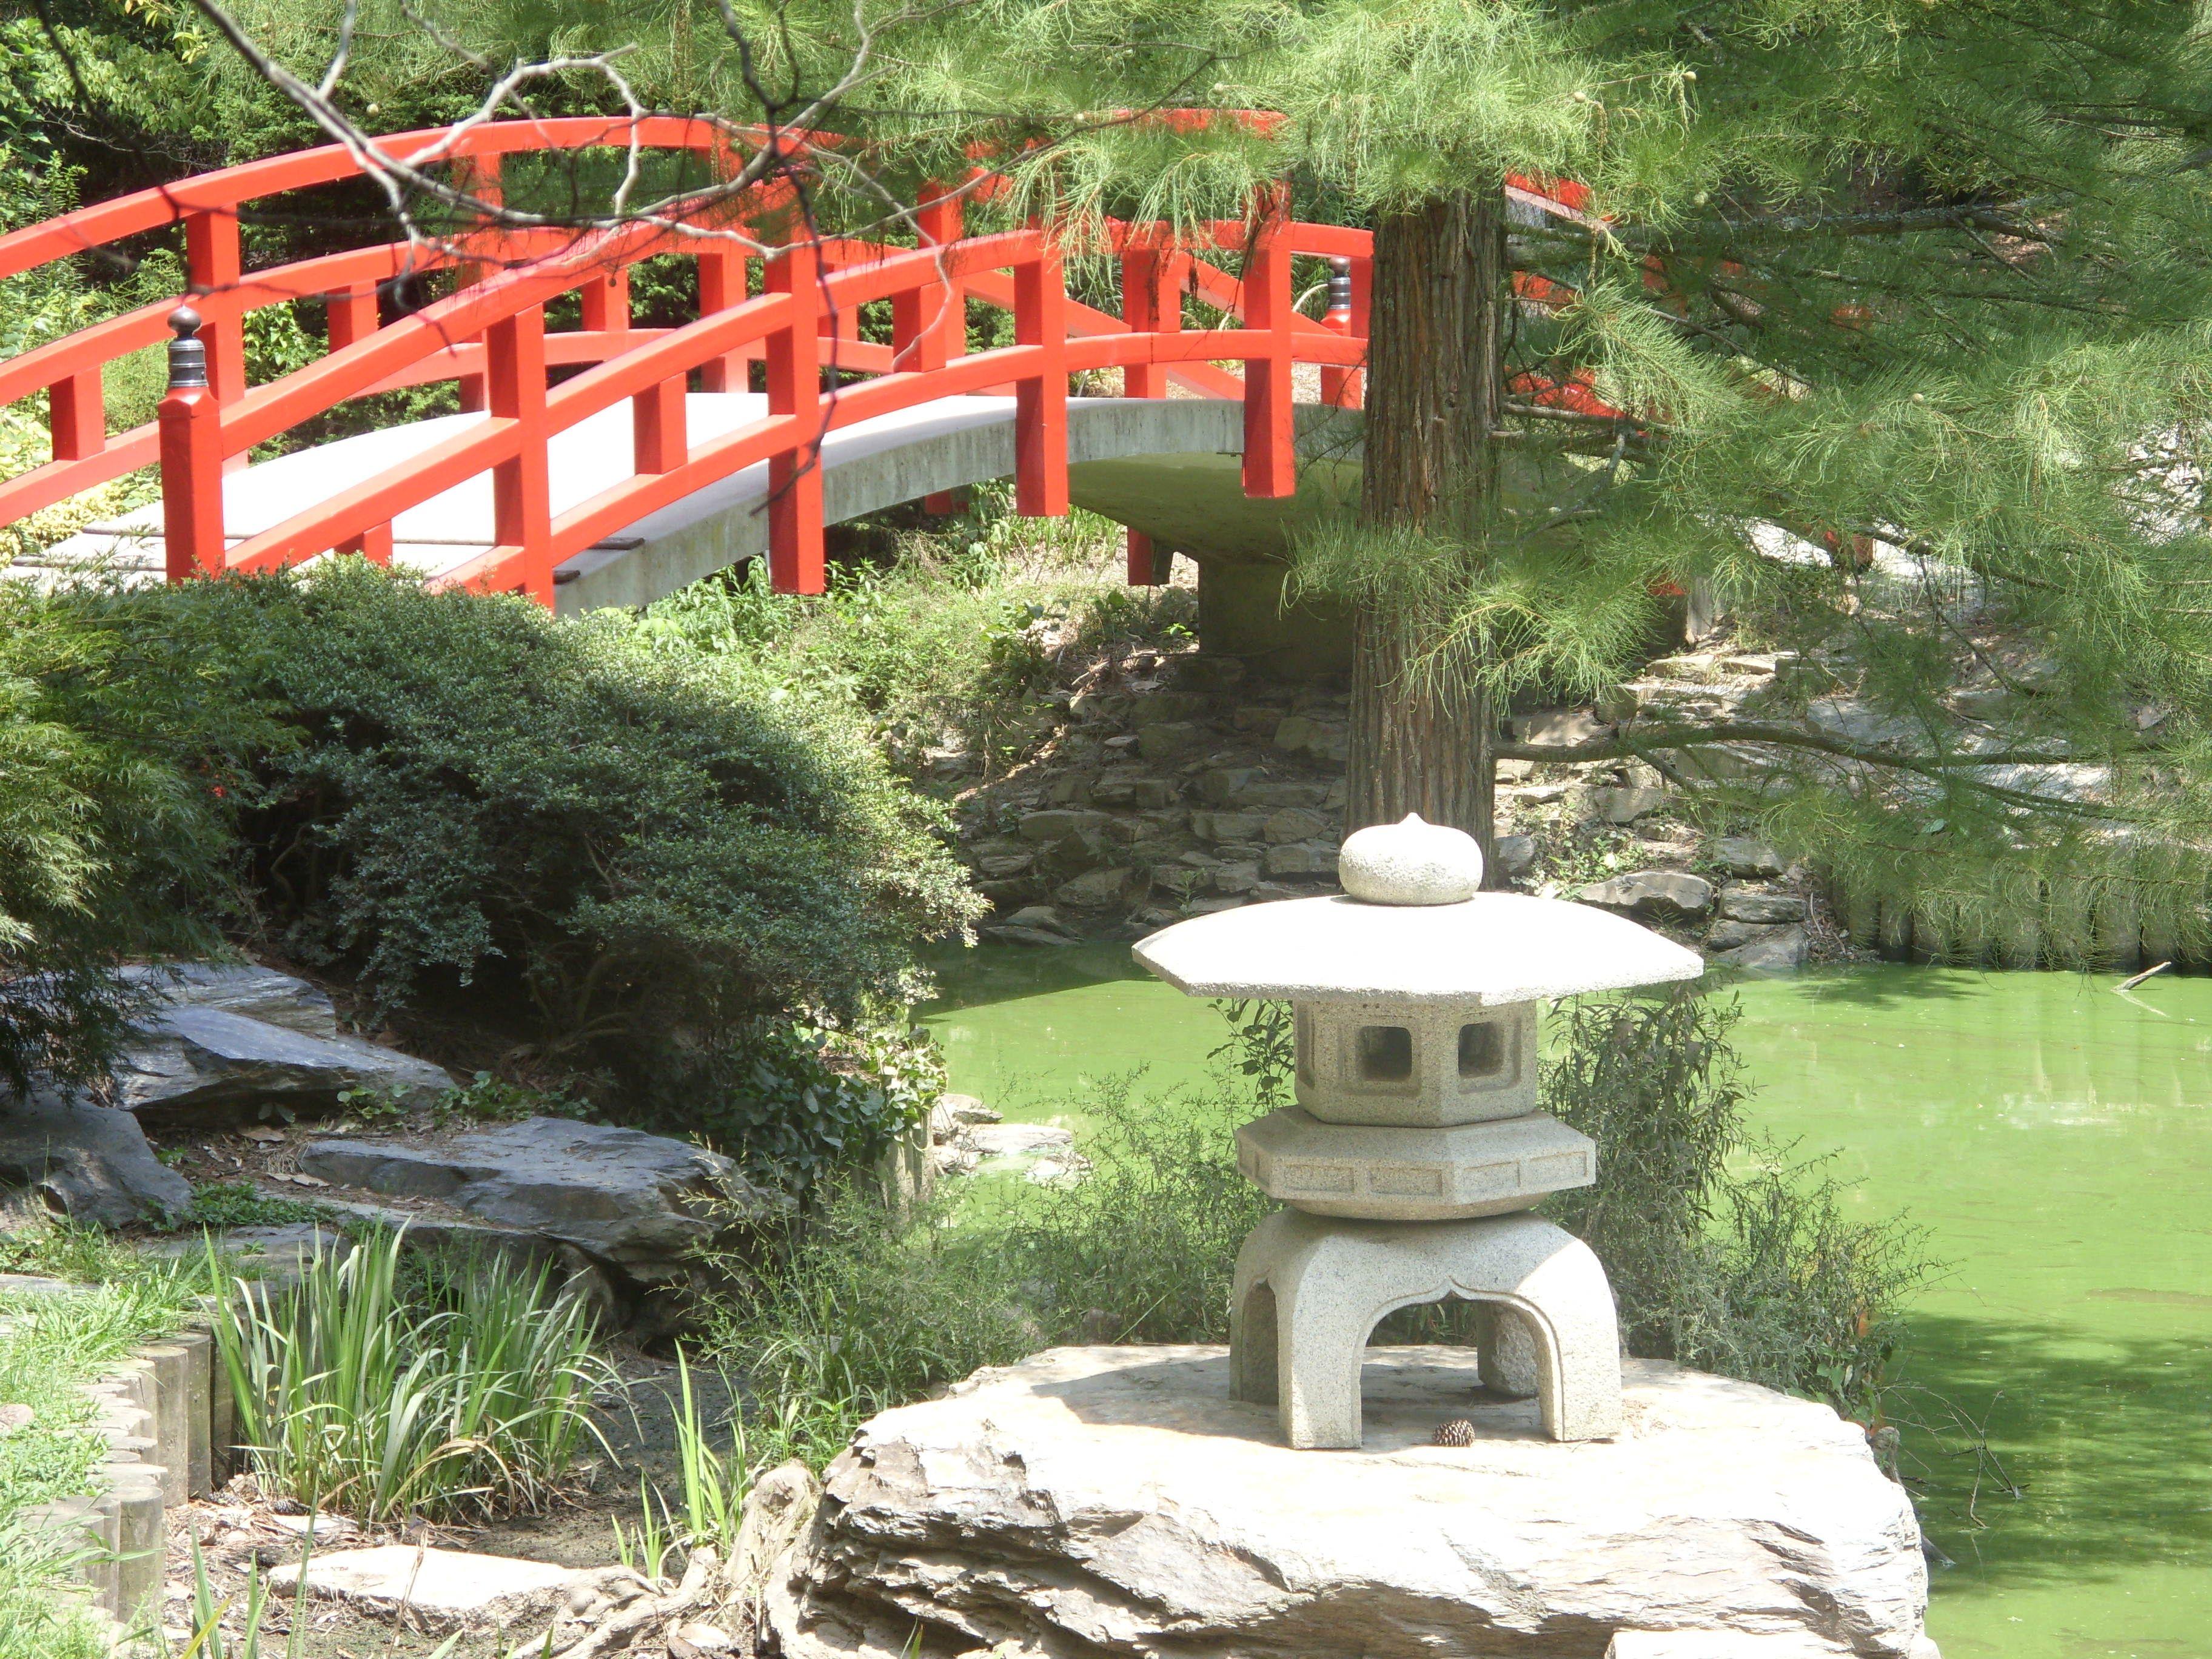 Duke Gardens Garden, Garden bridge, Outdoor structures